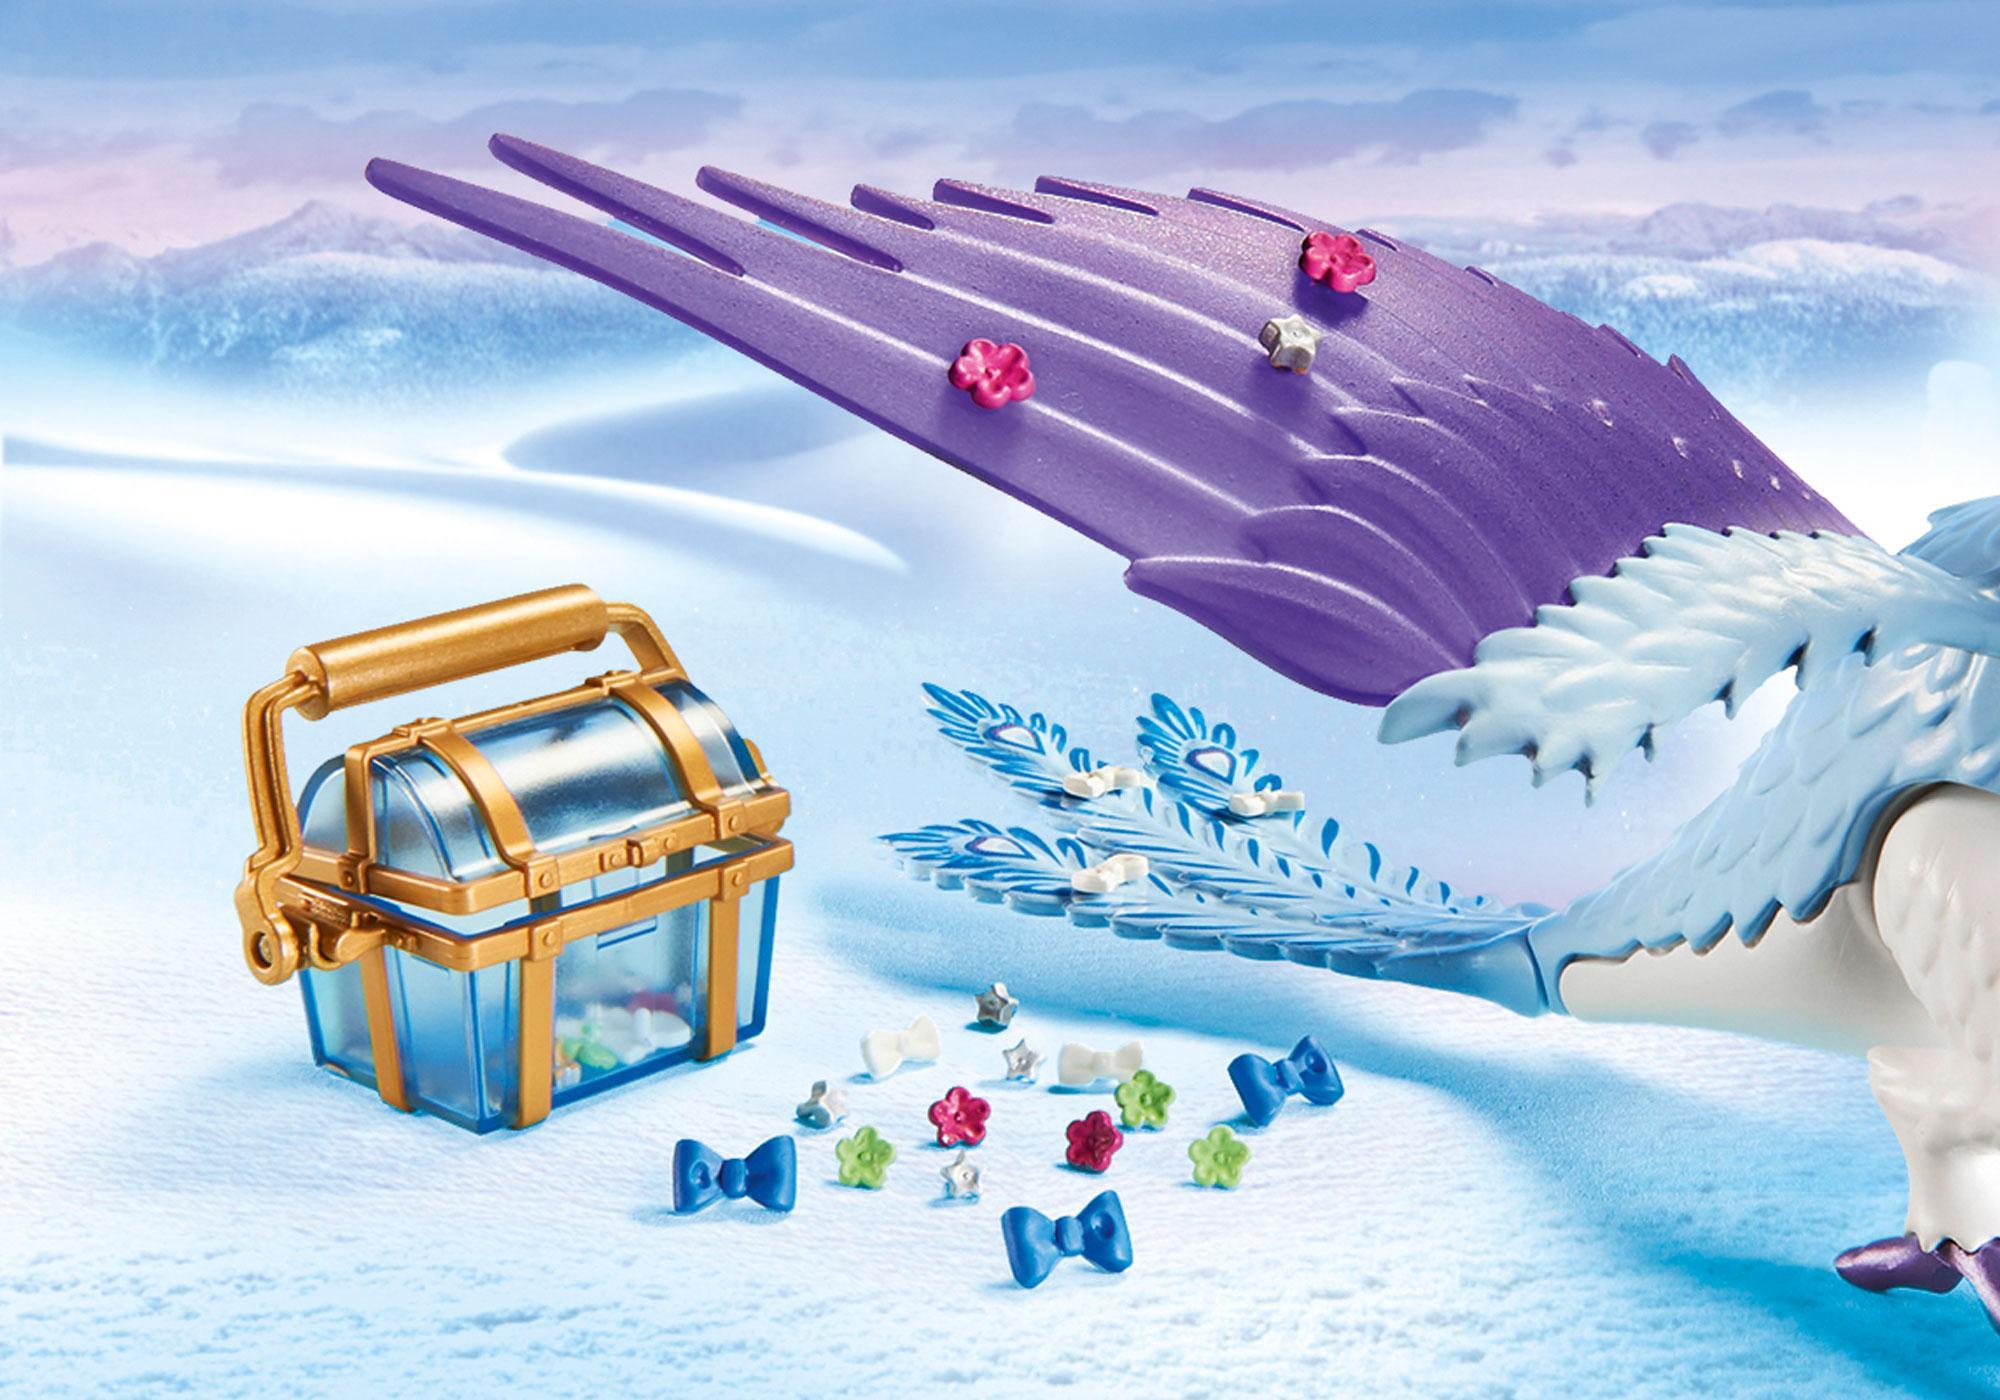 http://media.playmobil.com/i/playmobil/9472_product_extra2/Winter Phoenix